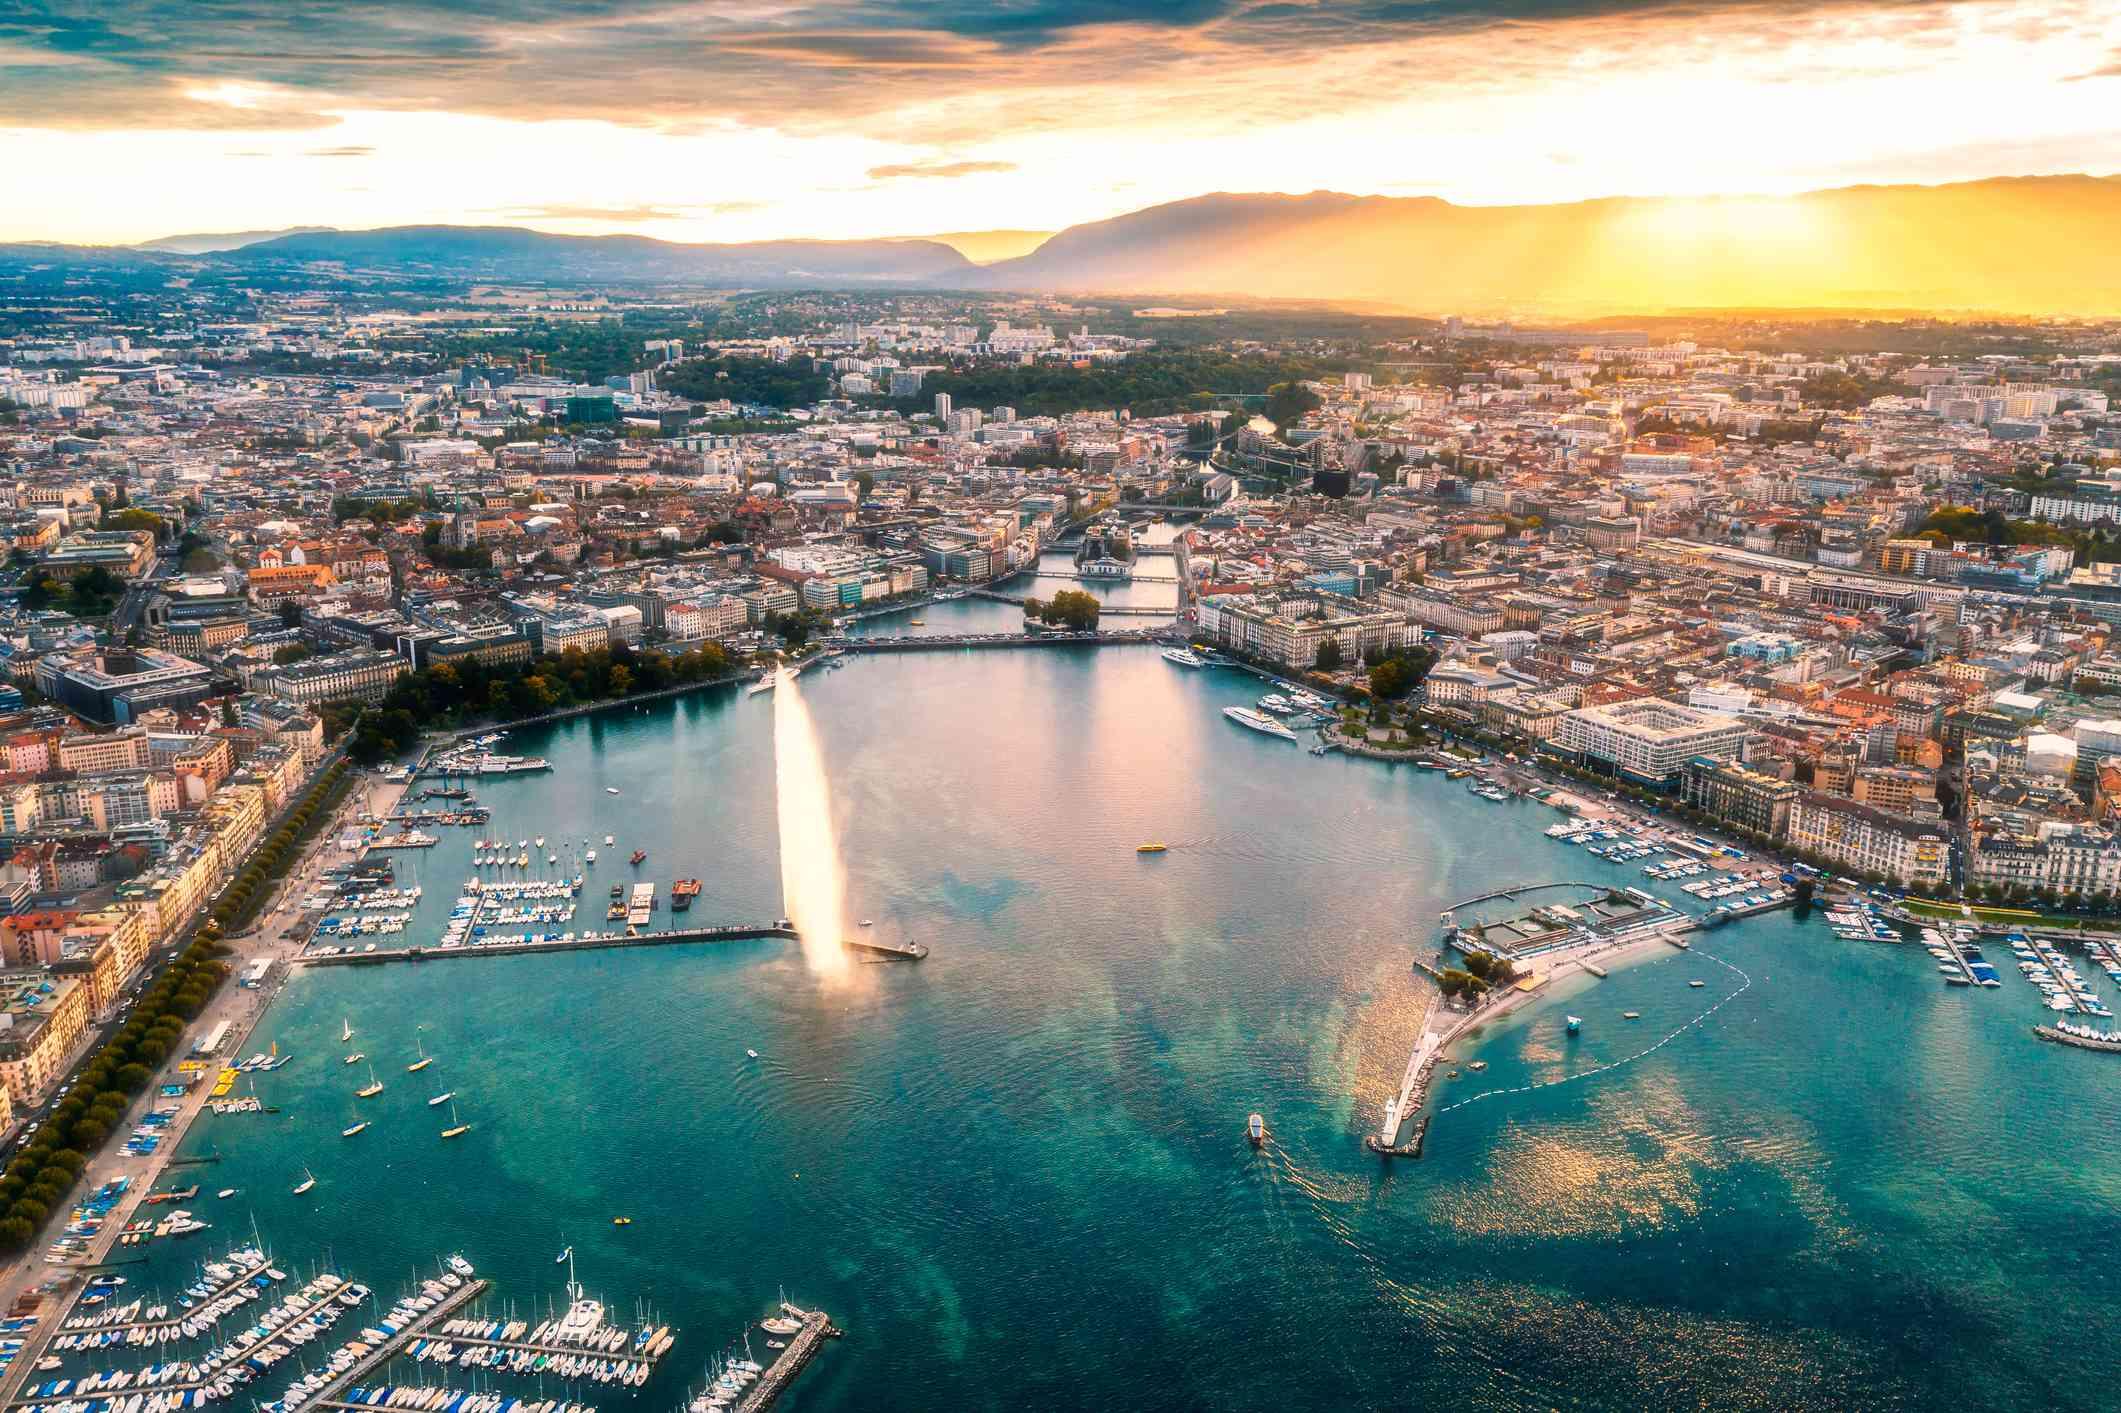 aerial view of Geneva city at sunset